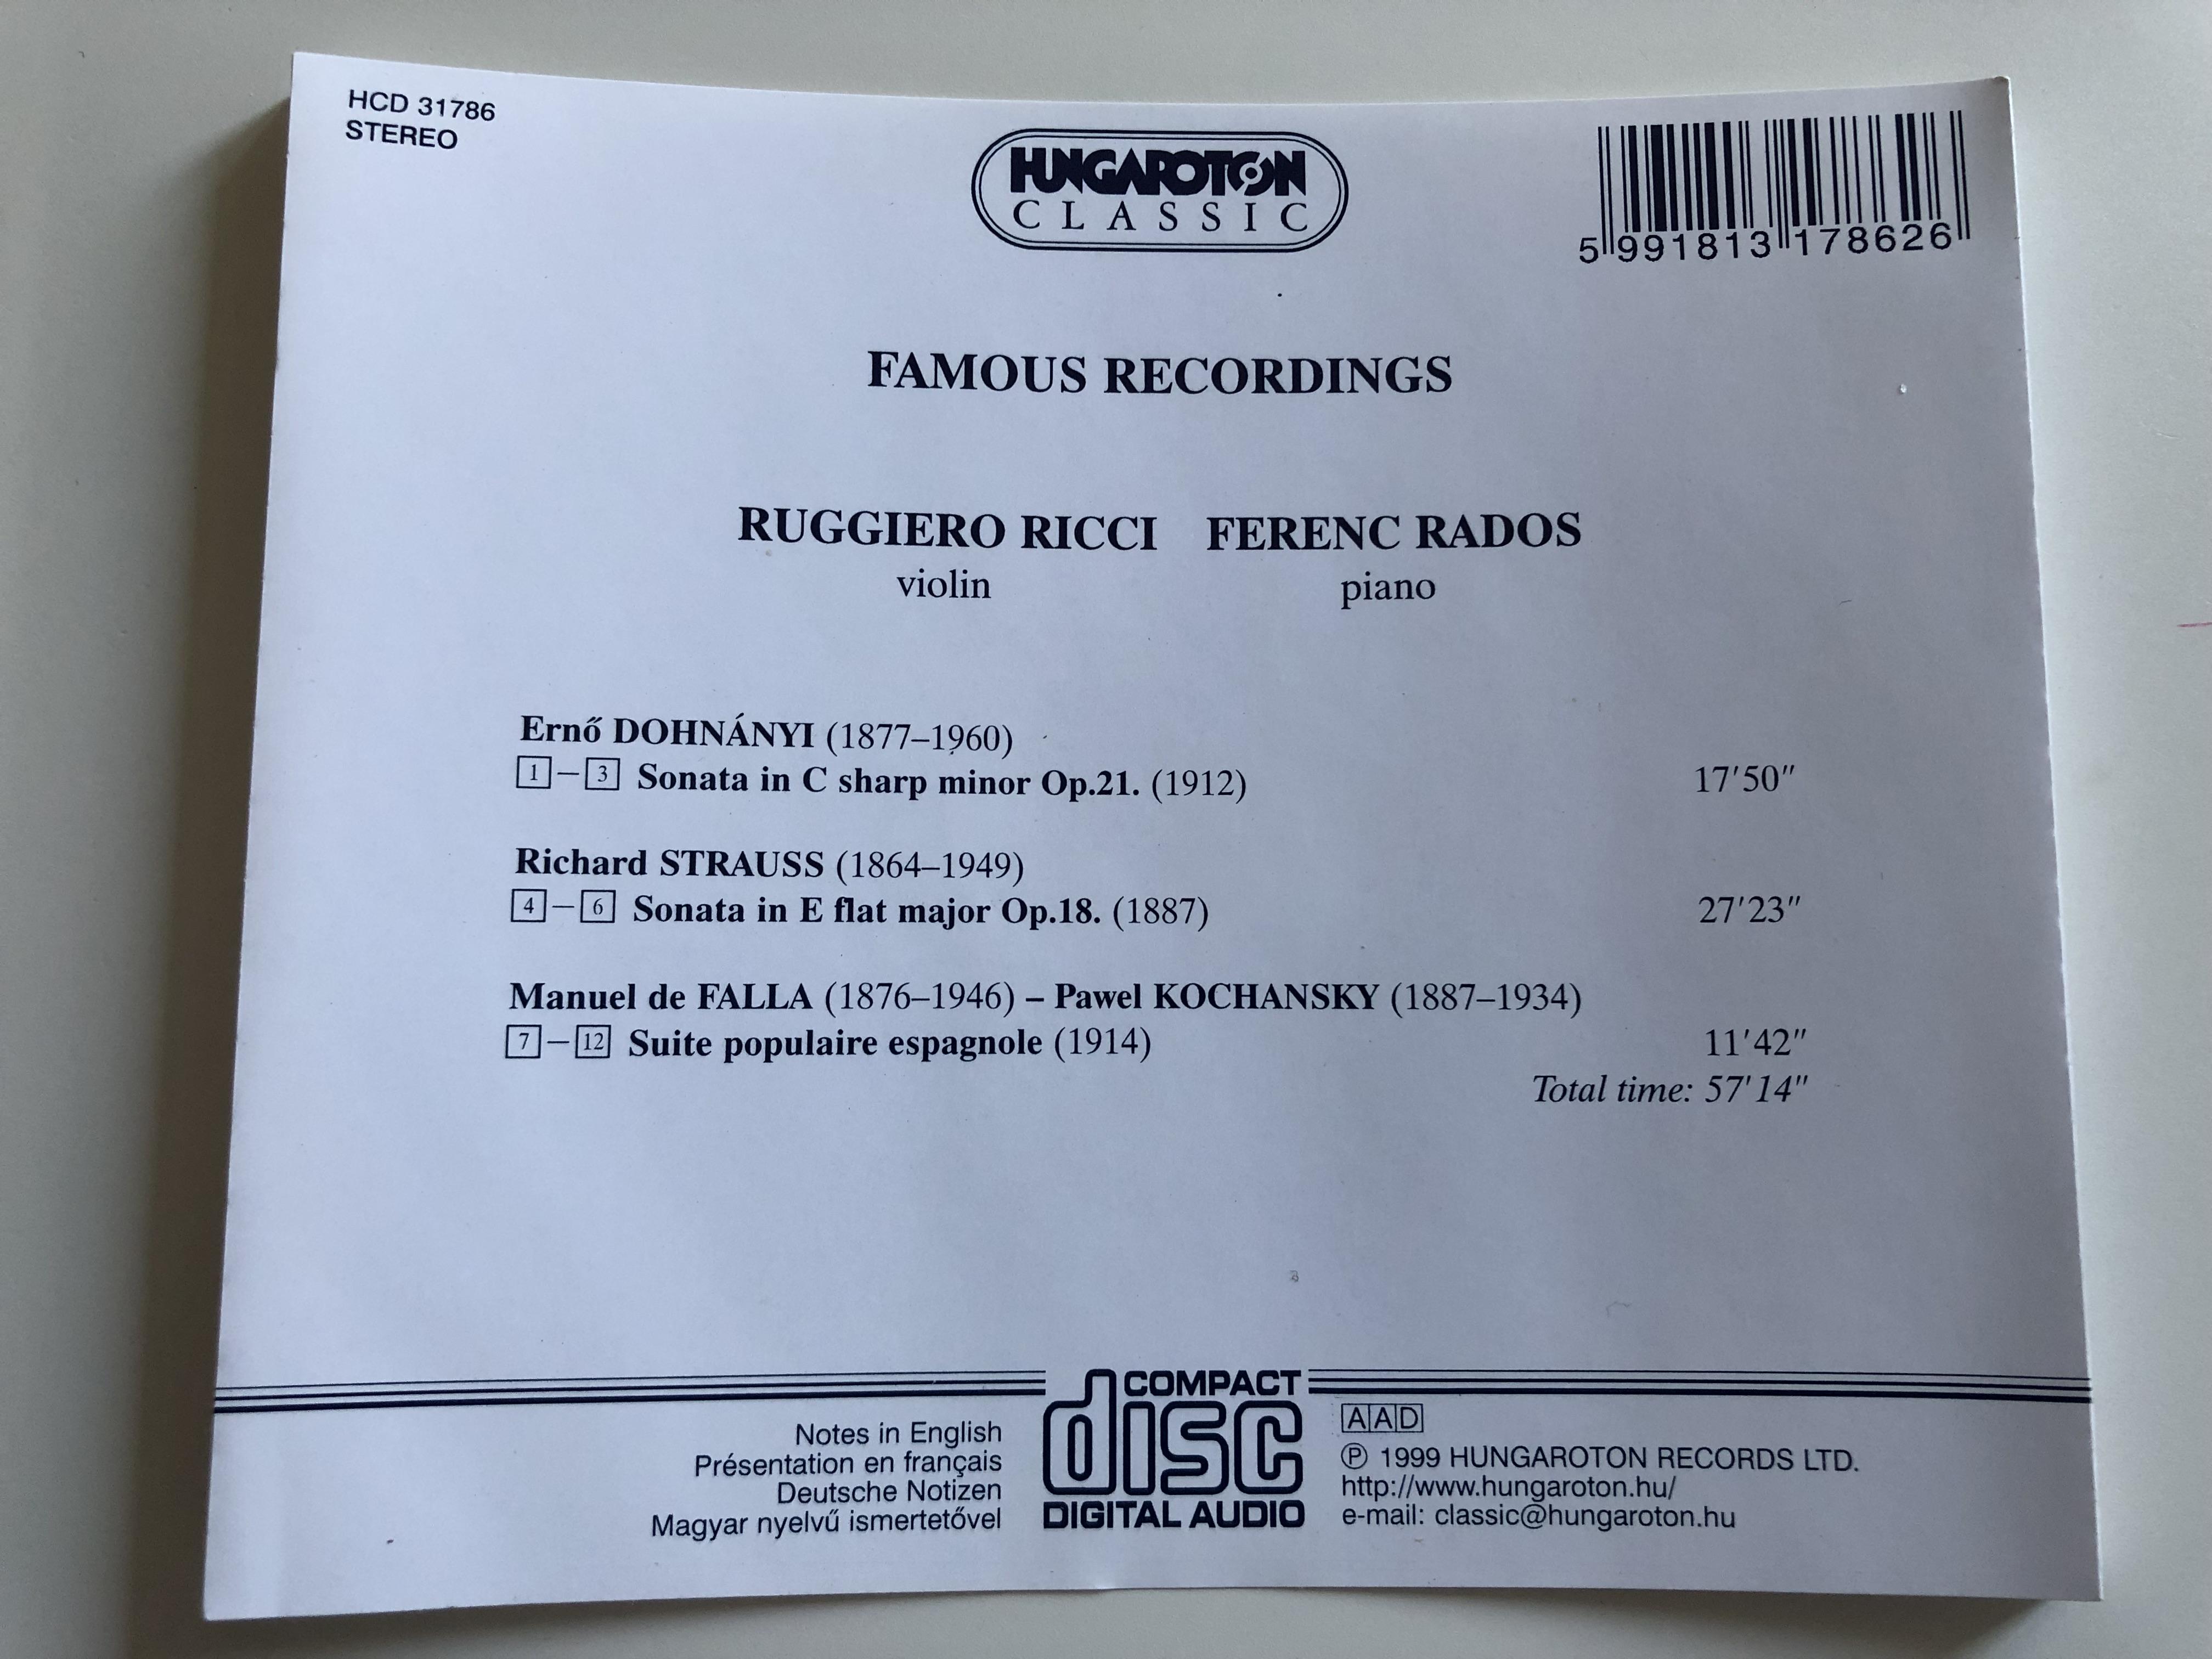 dohnanyi-r.-strauss-de-falla-played-by-ruggiero-ricci-violin-ferenc-rados-piano-hungaroton-classic-audio-cd-1999-stereo-hcd-31786-7-.jpg